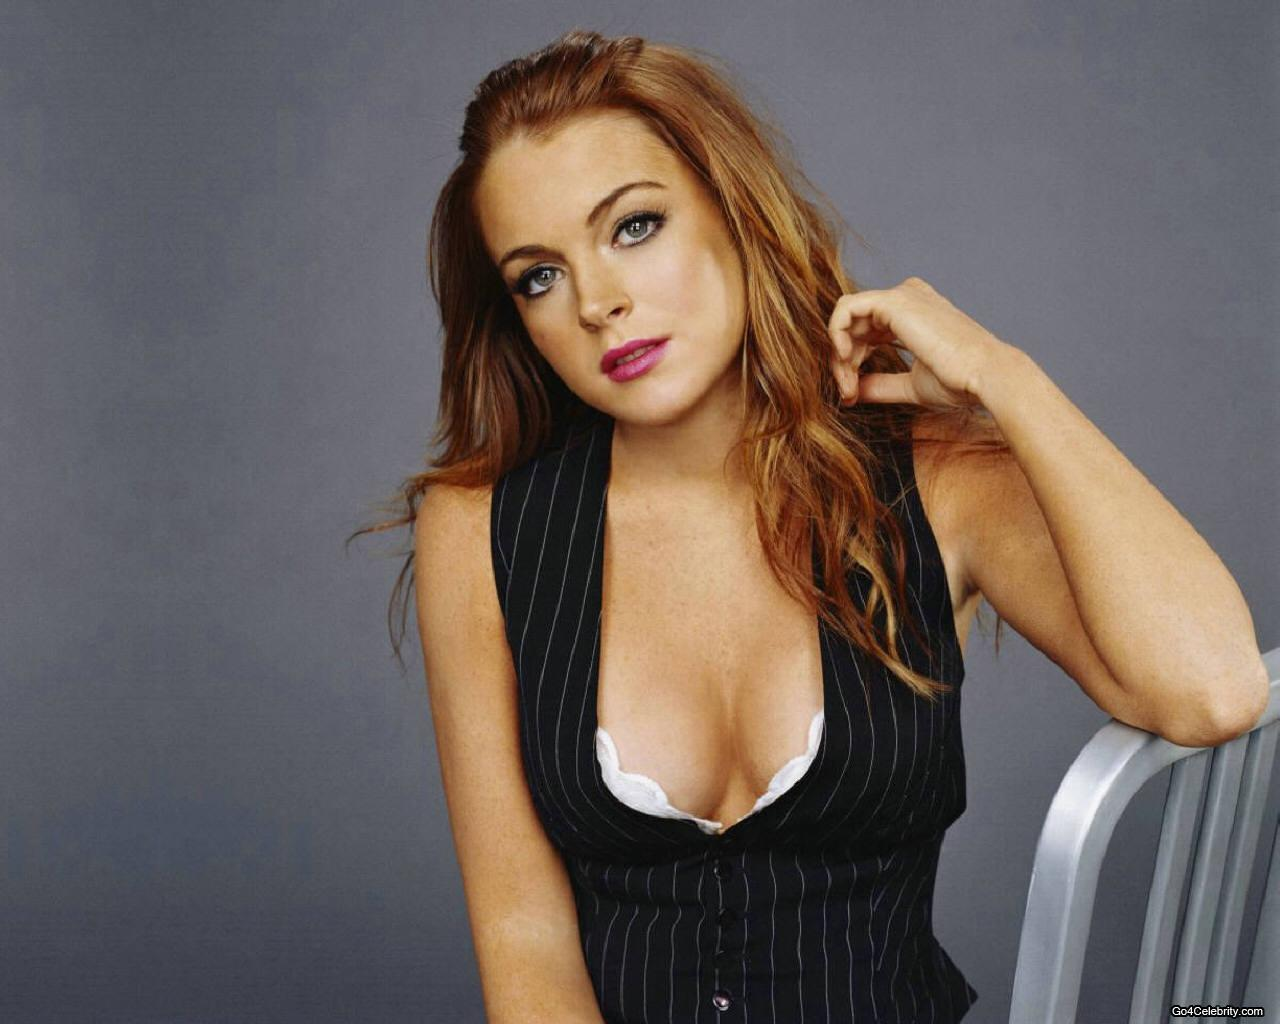 http://1.bp.blogspot.com/-bA26VI6E2CY/UBuEy8m90aI/AAAAAAAABlk/UZmz19Pjxe8/s1600/Lindsay-Lohan-images.jpg